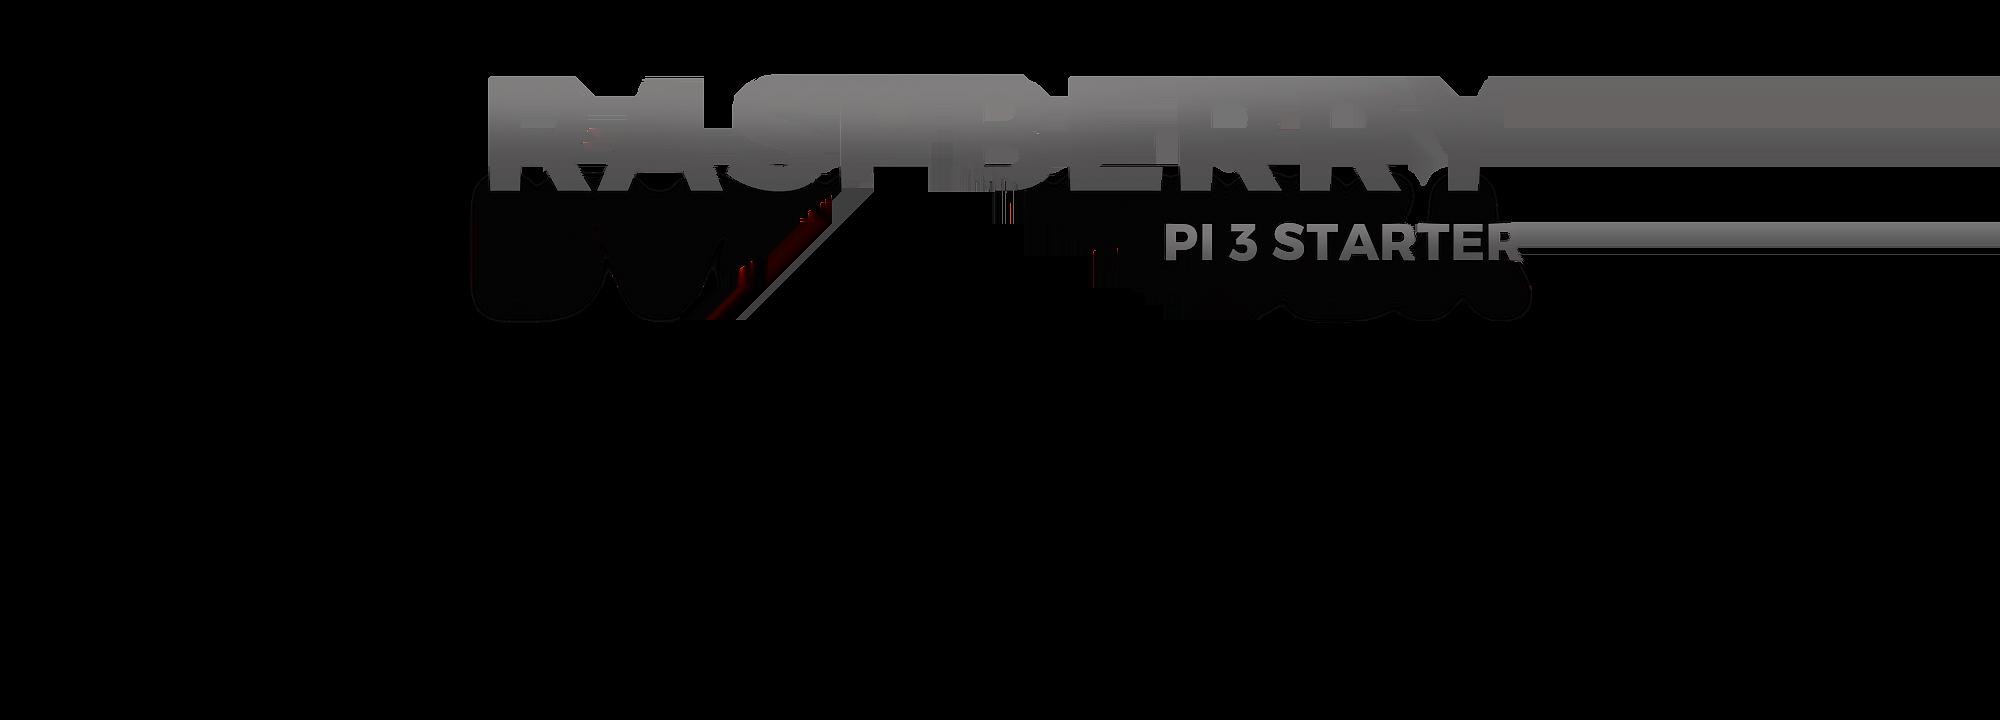 capa_raspberry.png